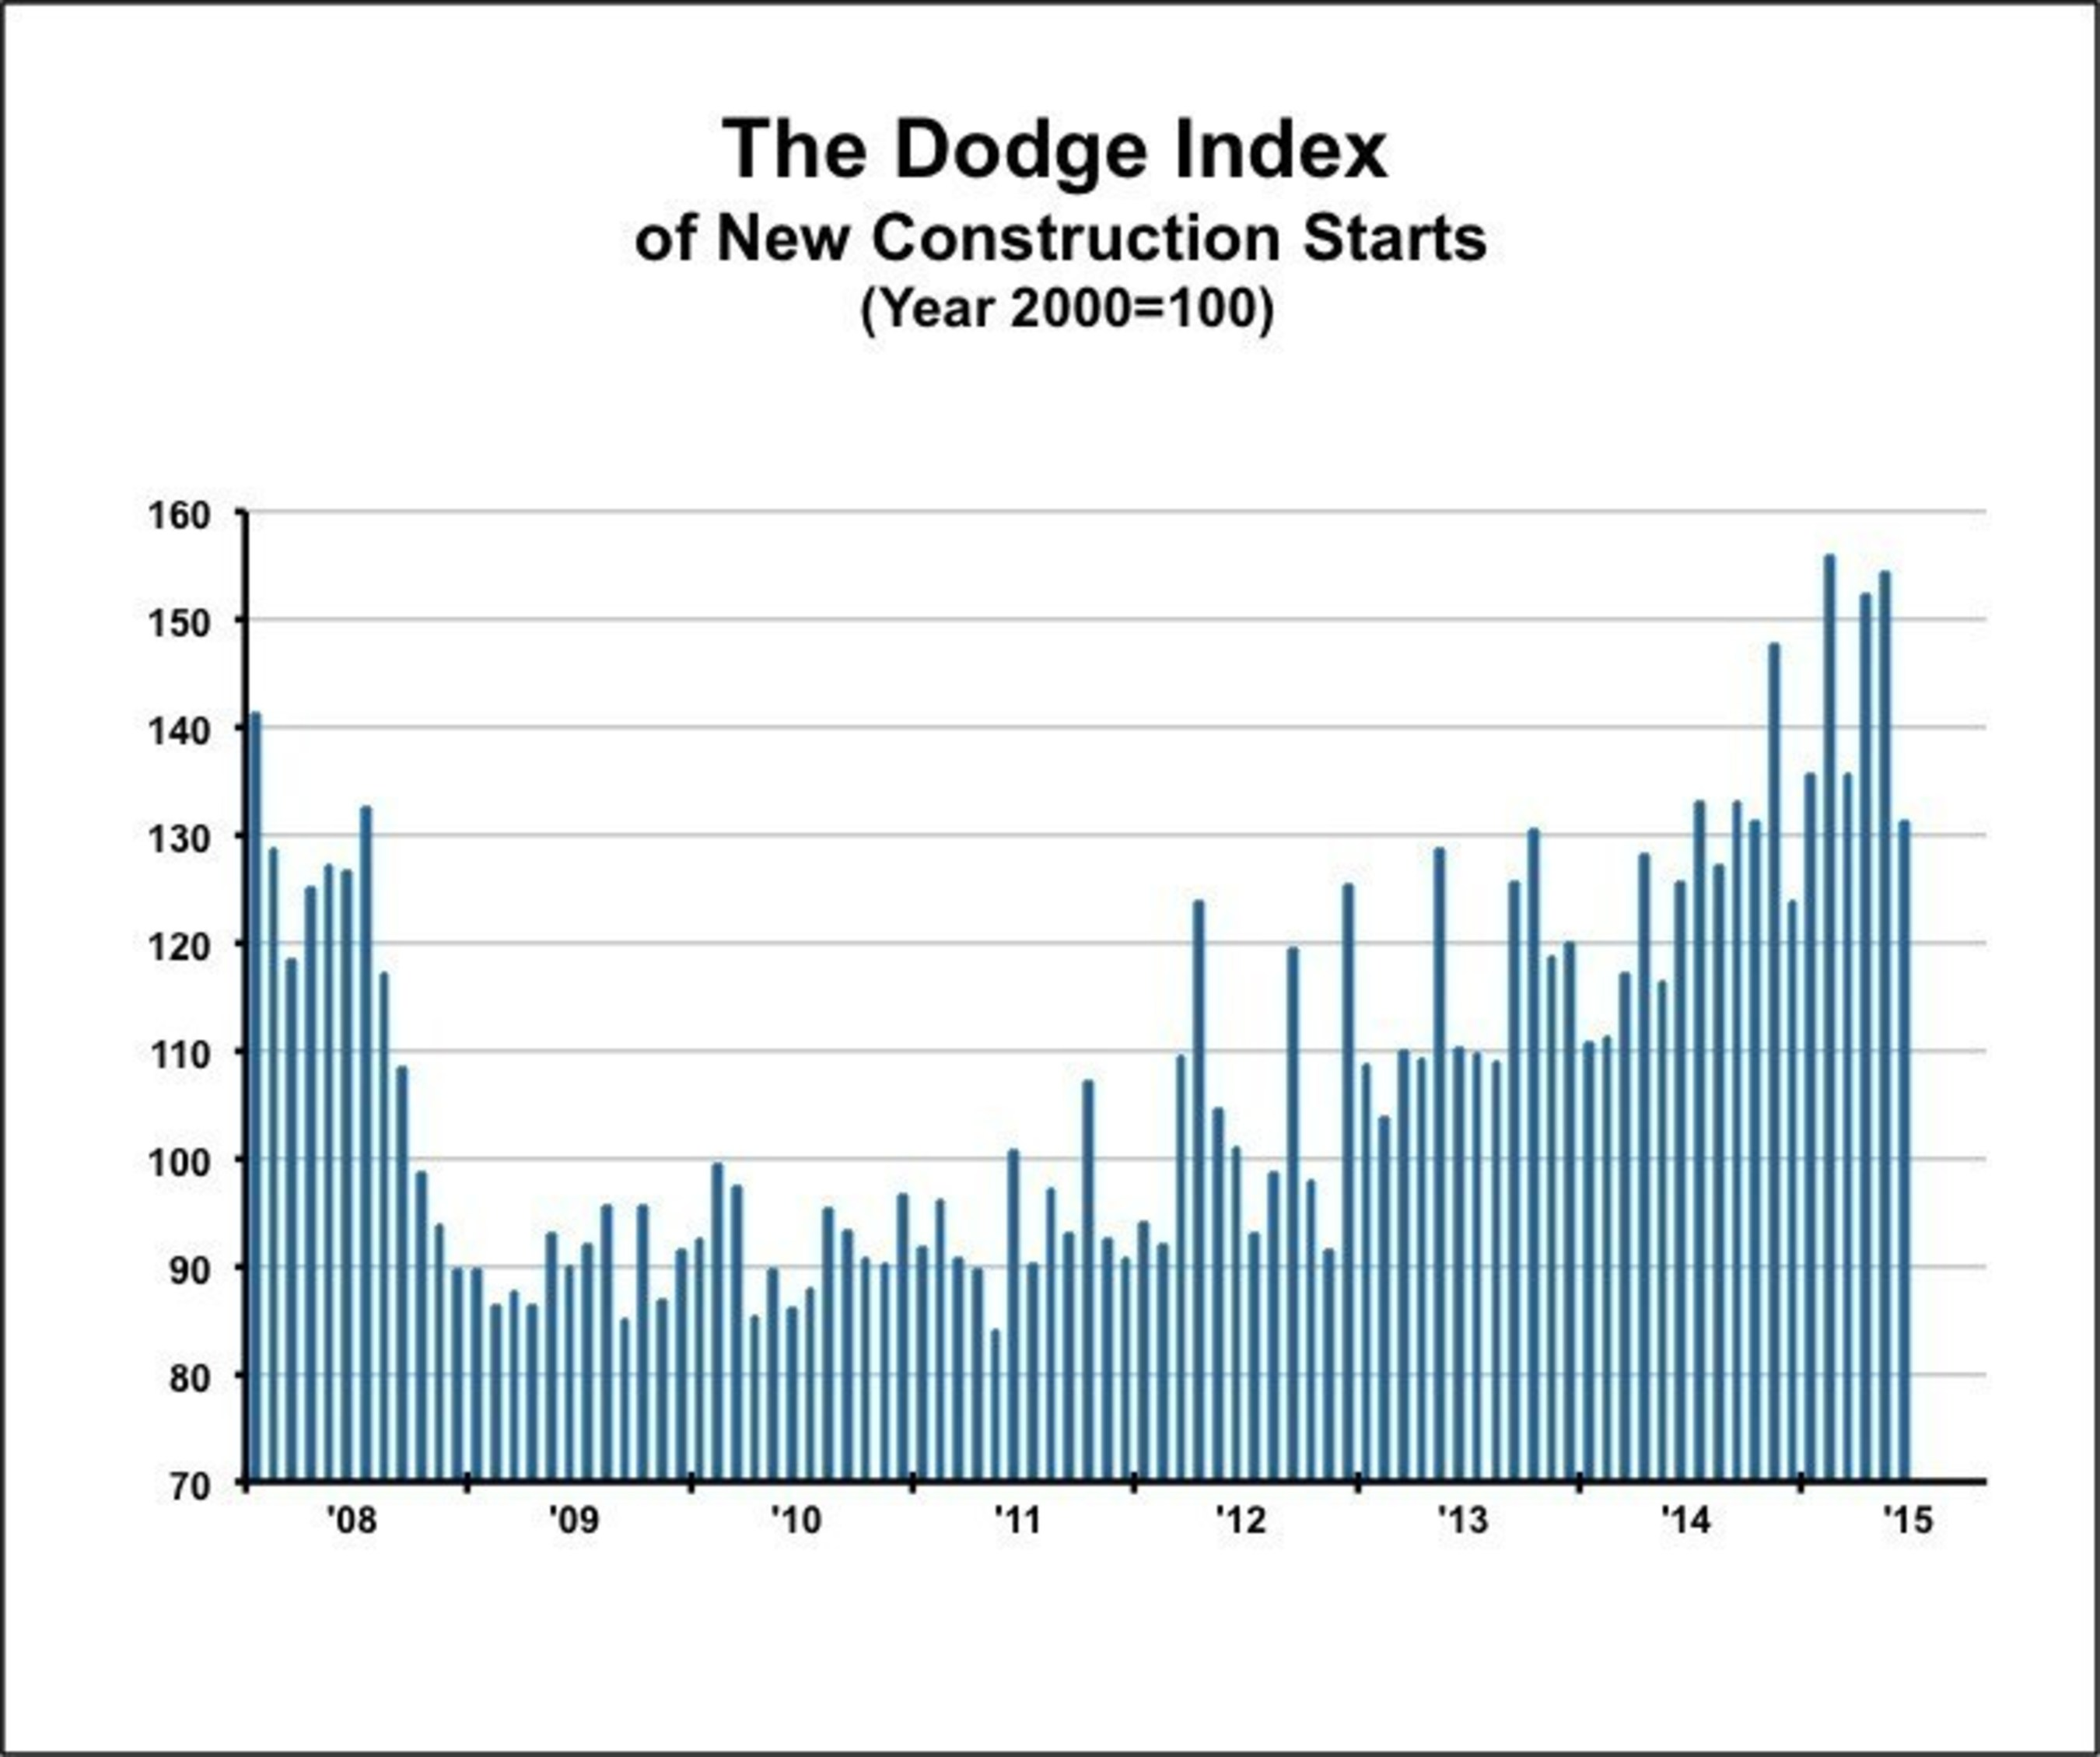 The Dodge Index of New Construction Starts. Source: Dodge Data & Analytics